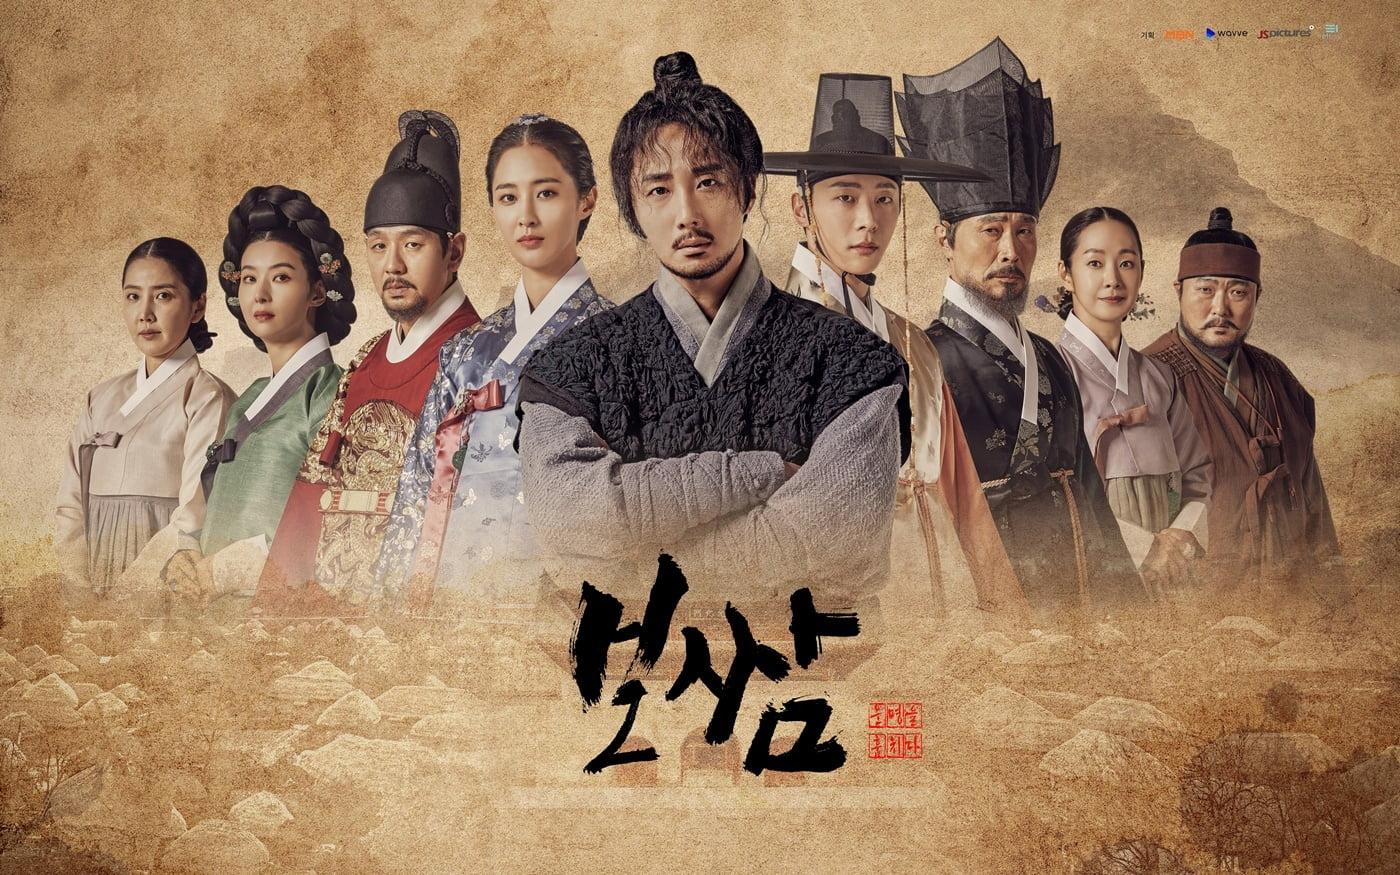 Боссам: воровство судьбы / Bossam: Steal the Fate (2021) Южная Корея